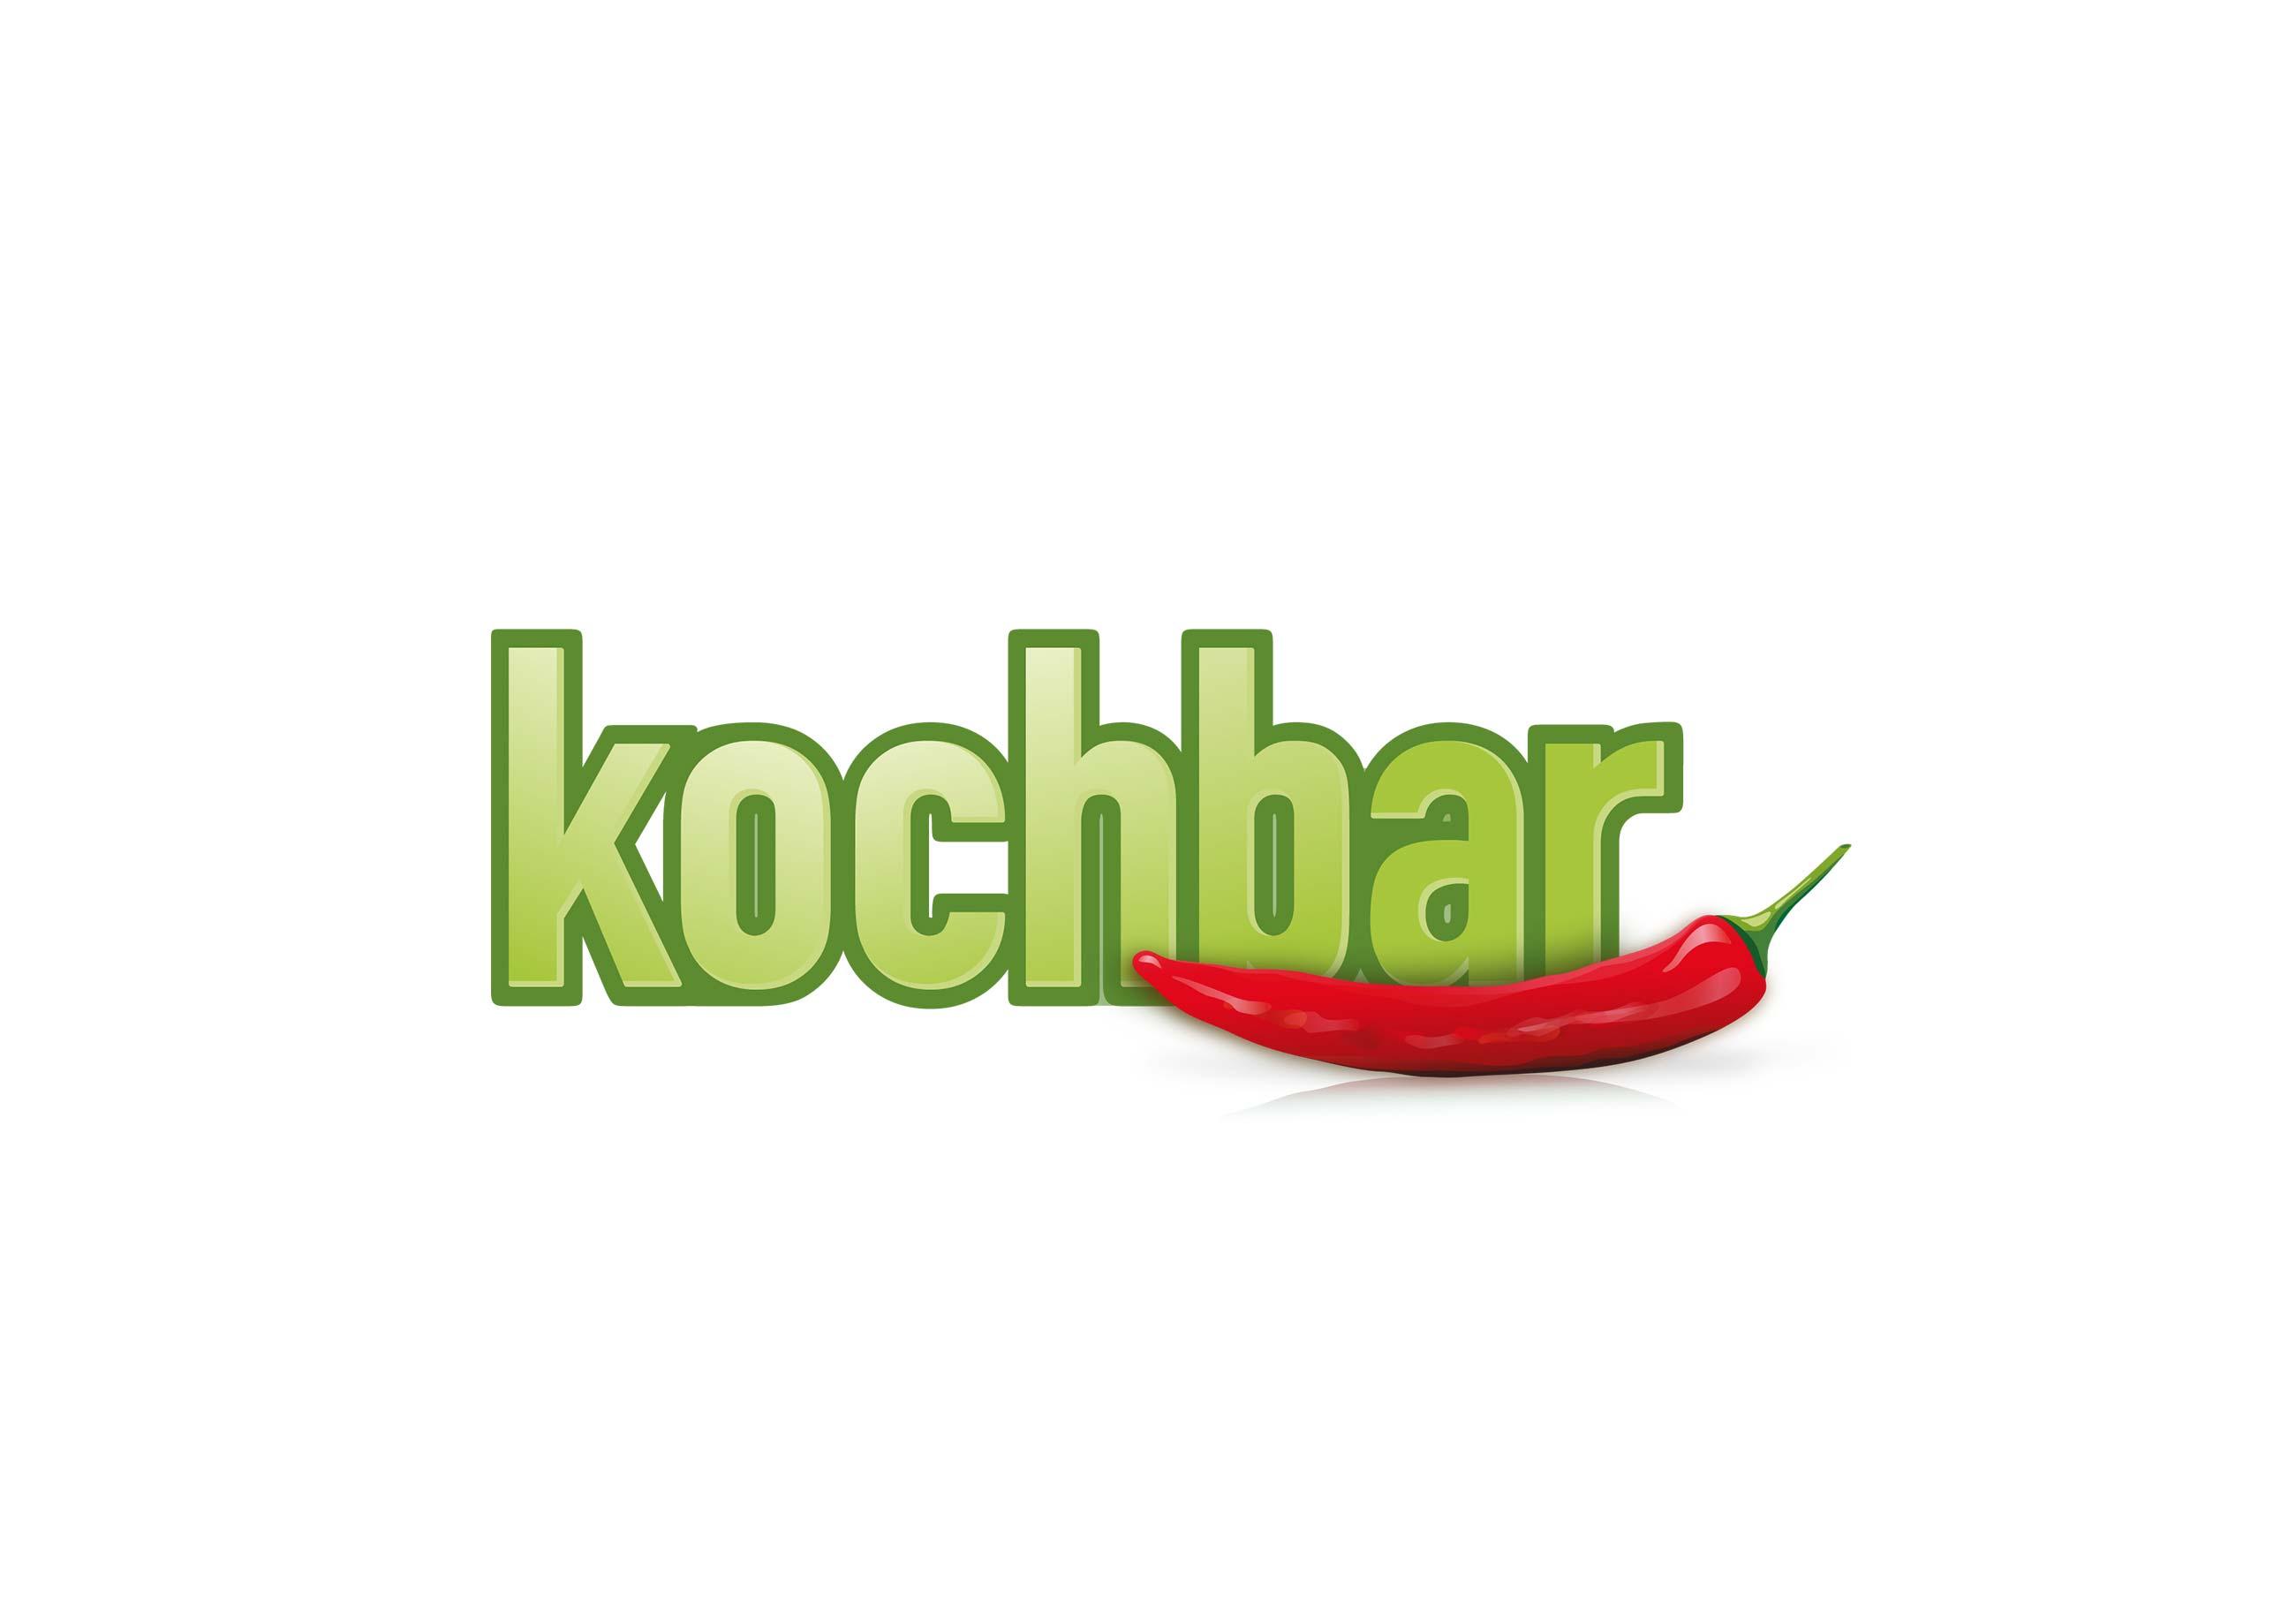 Kochbar Logo